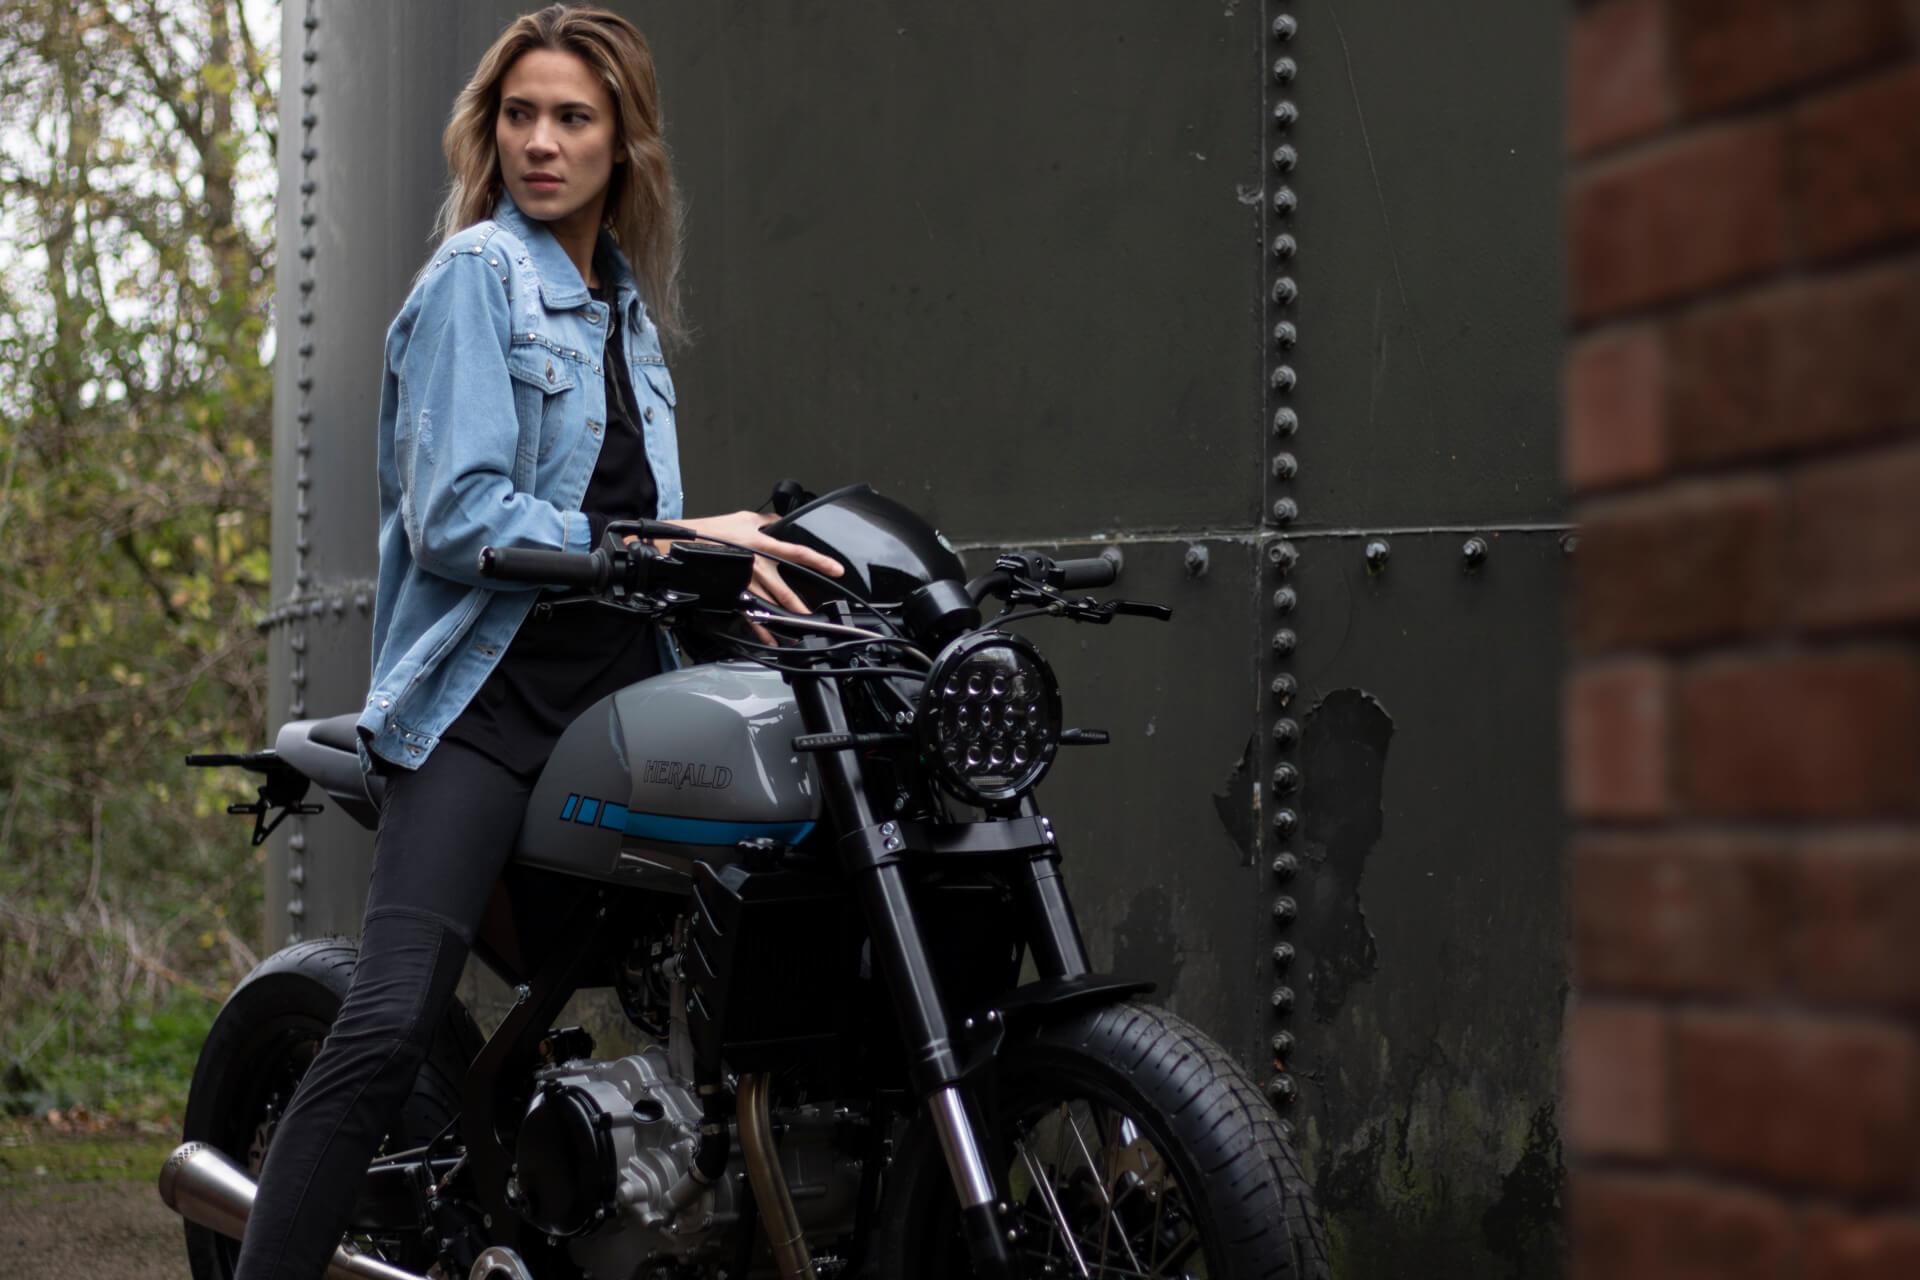 British-built motorcycle